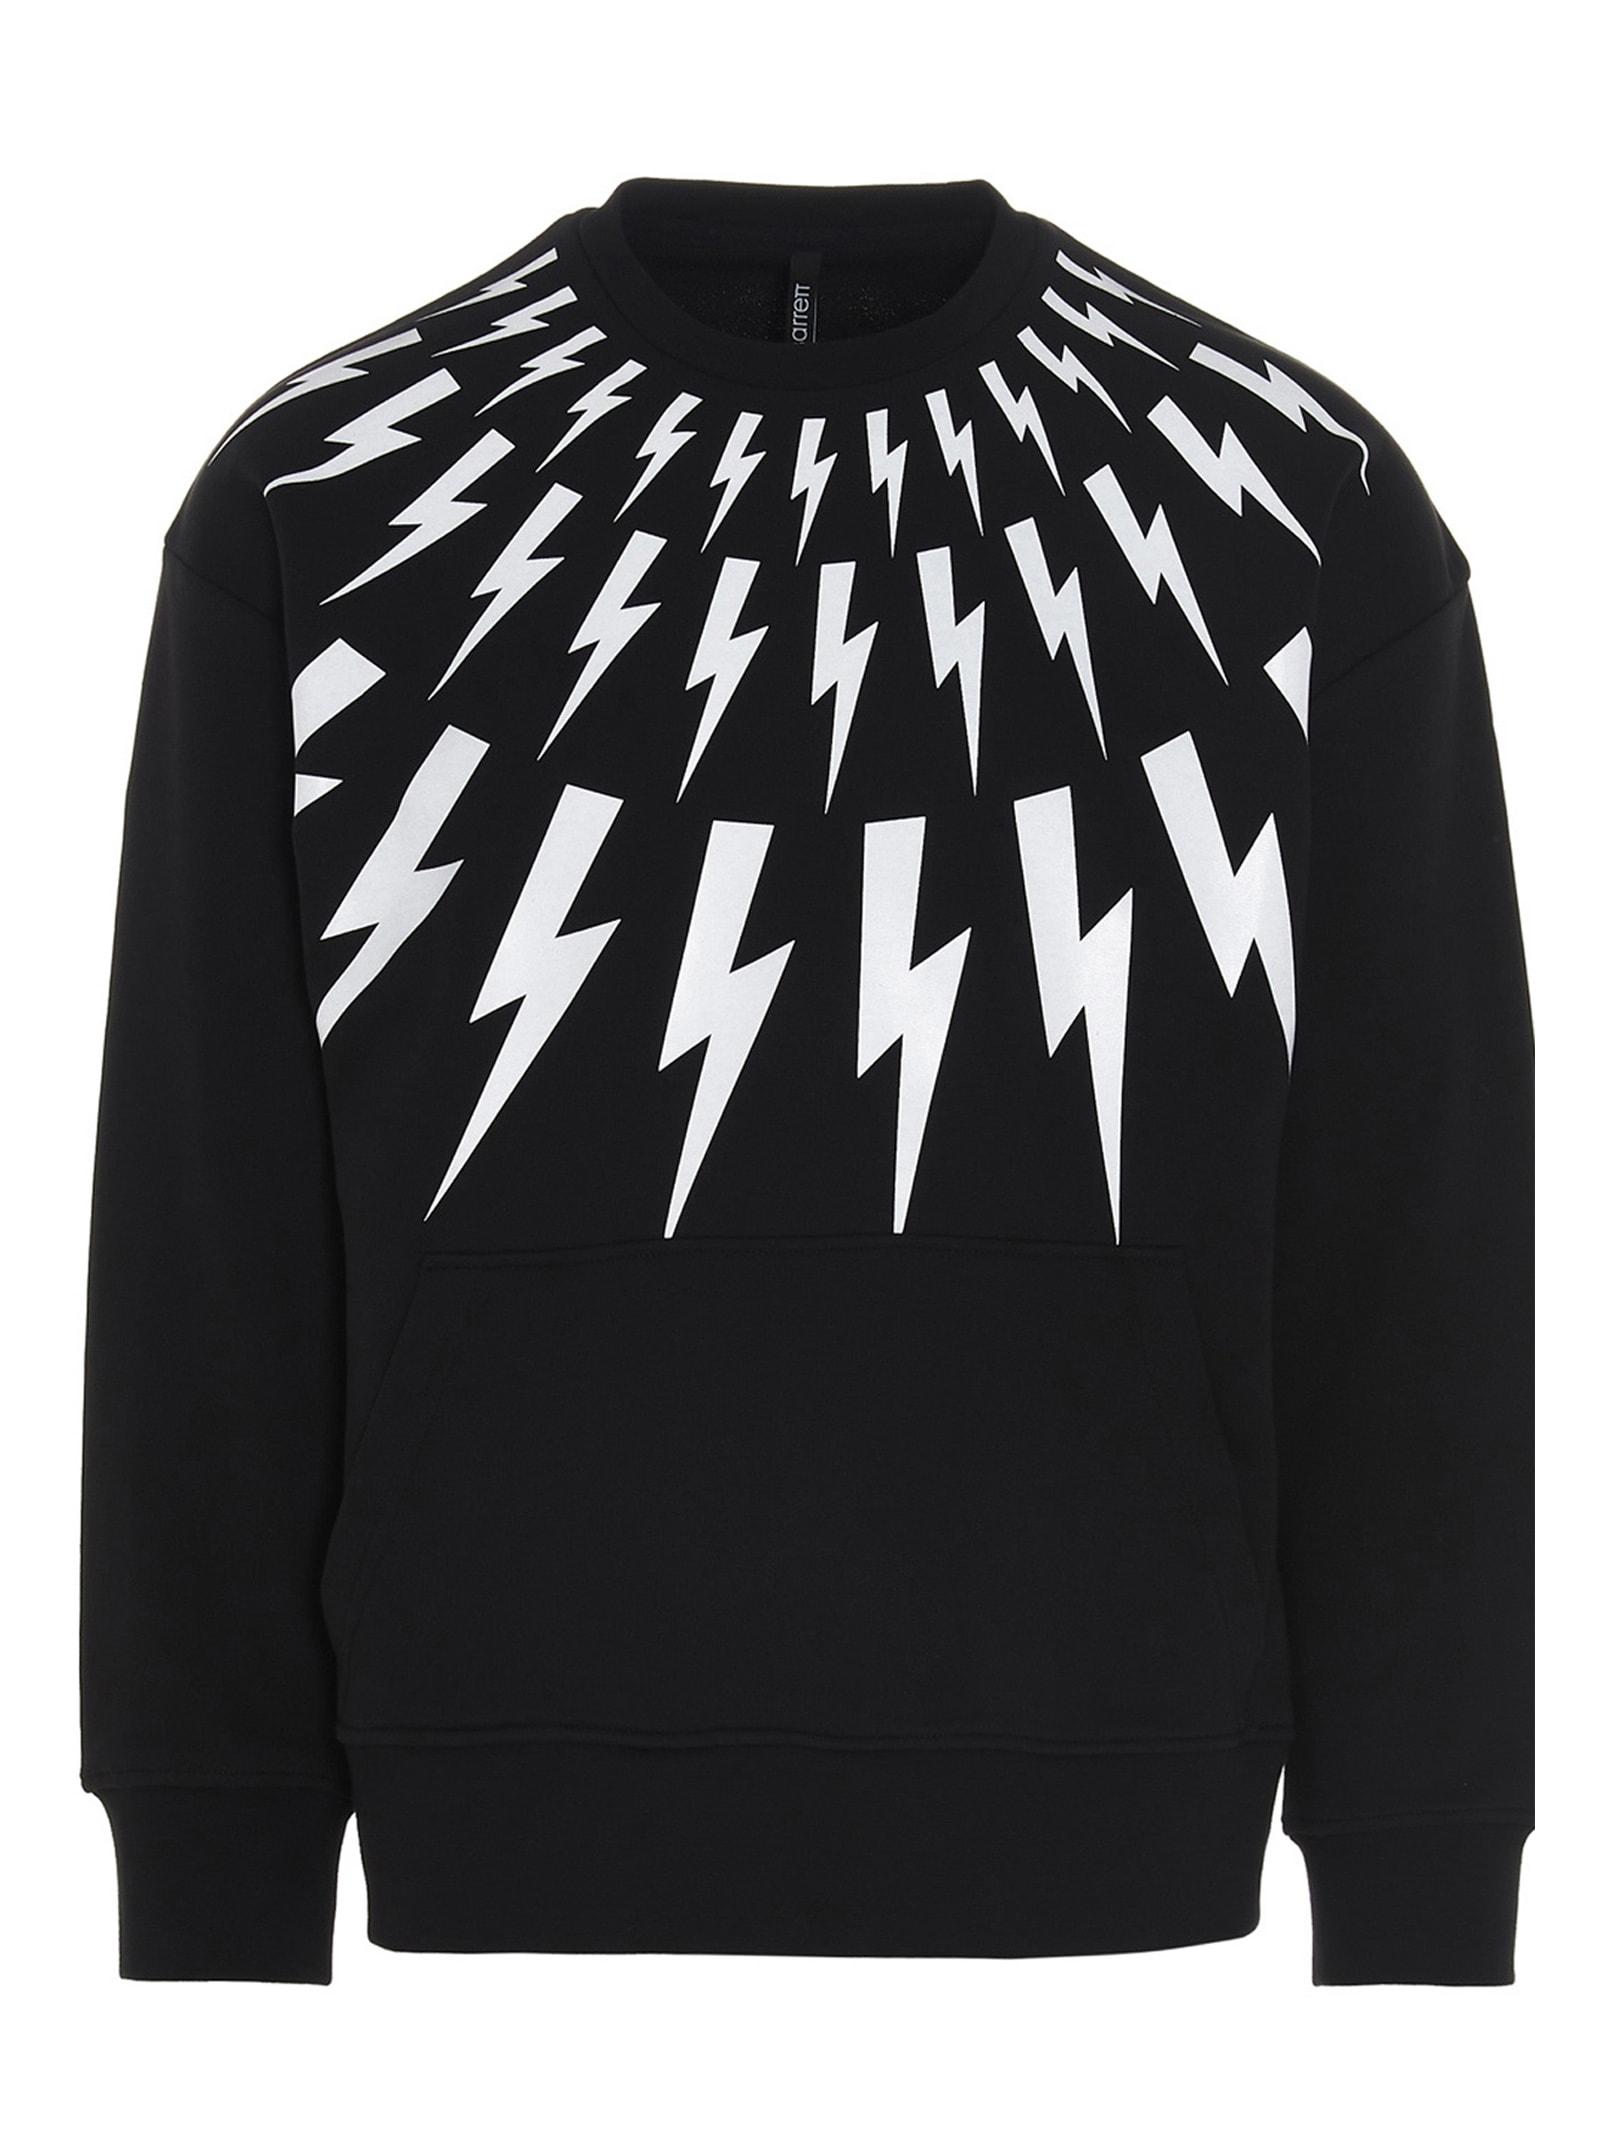 Neil Barrett Sweatshirts THUNDERBOLT SWEATSHIRT